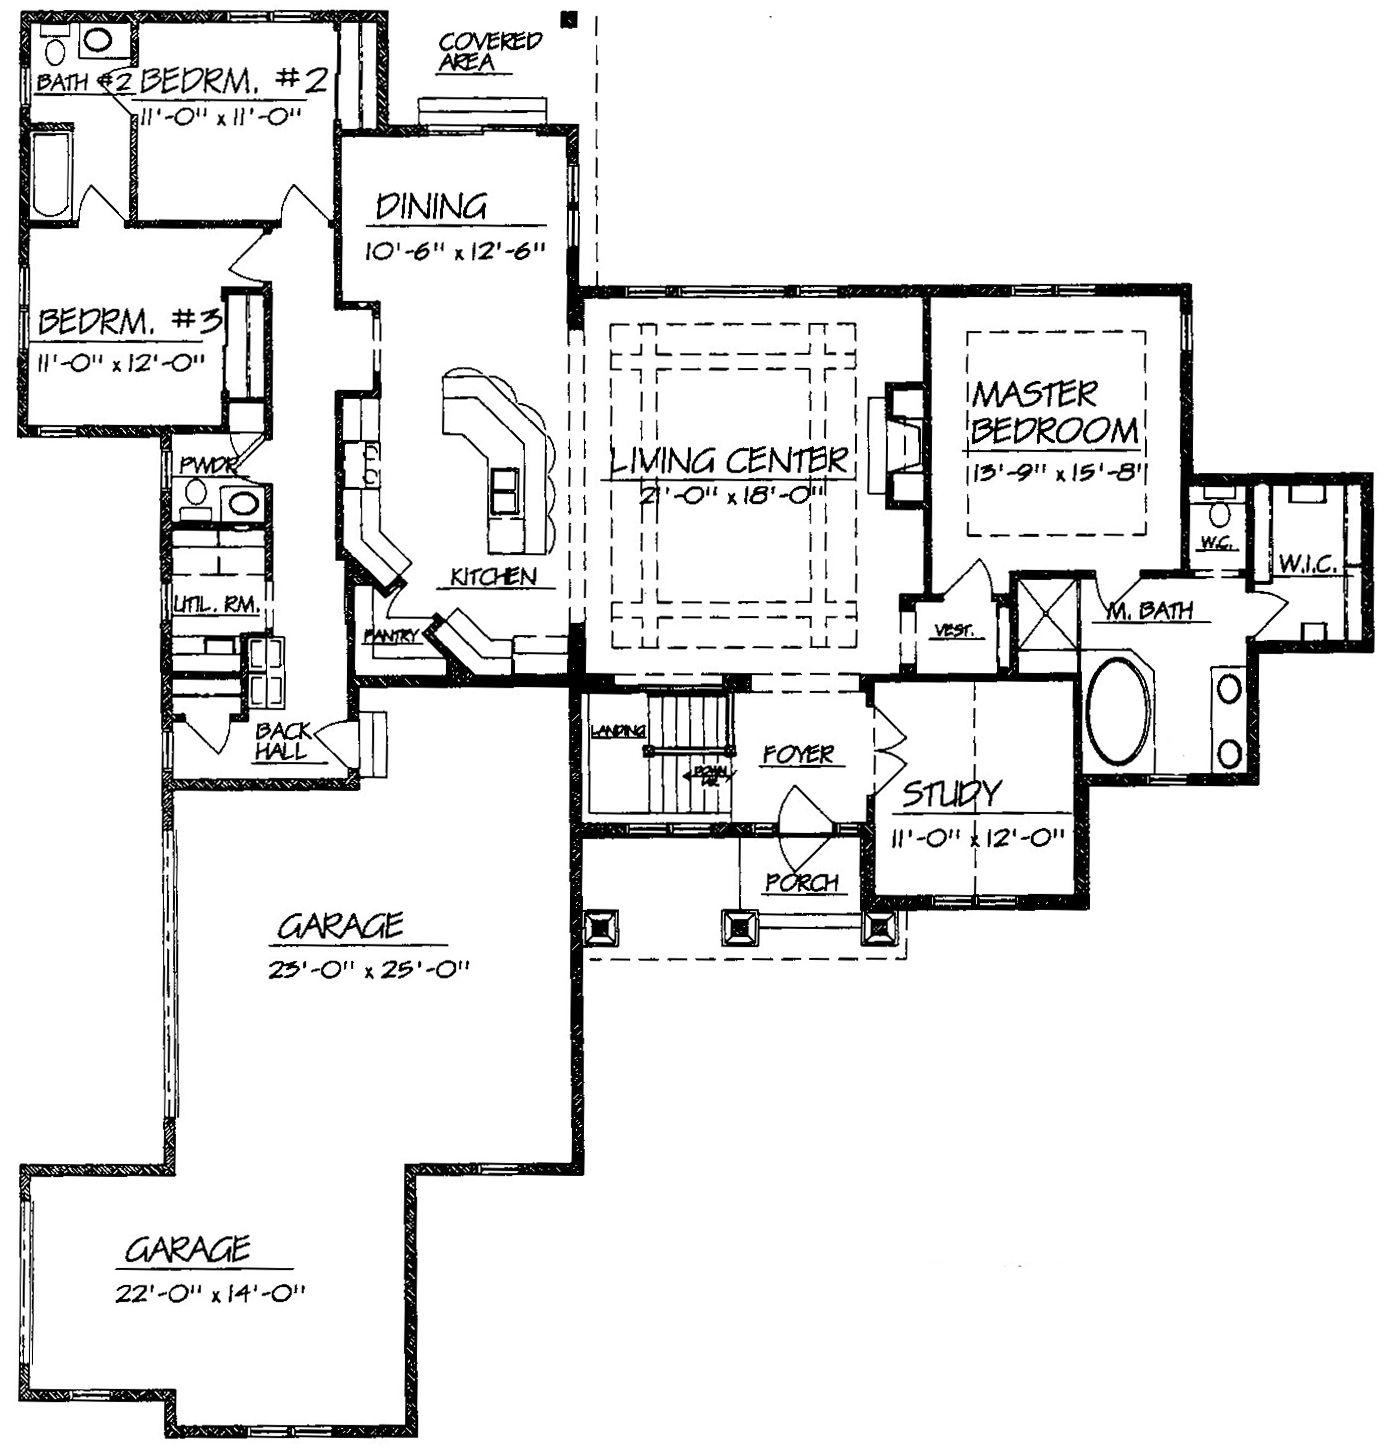 Luxury split level ranch house plans house floor ideas for Split level house floor plans